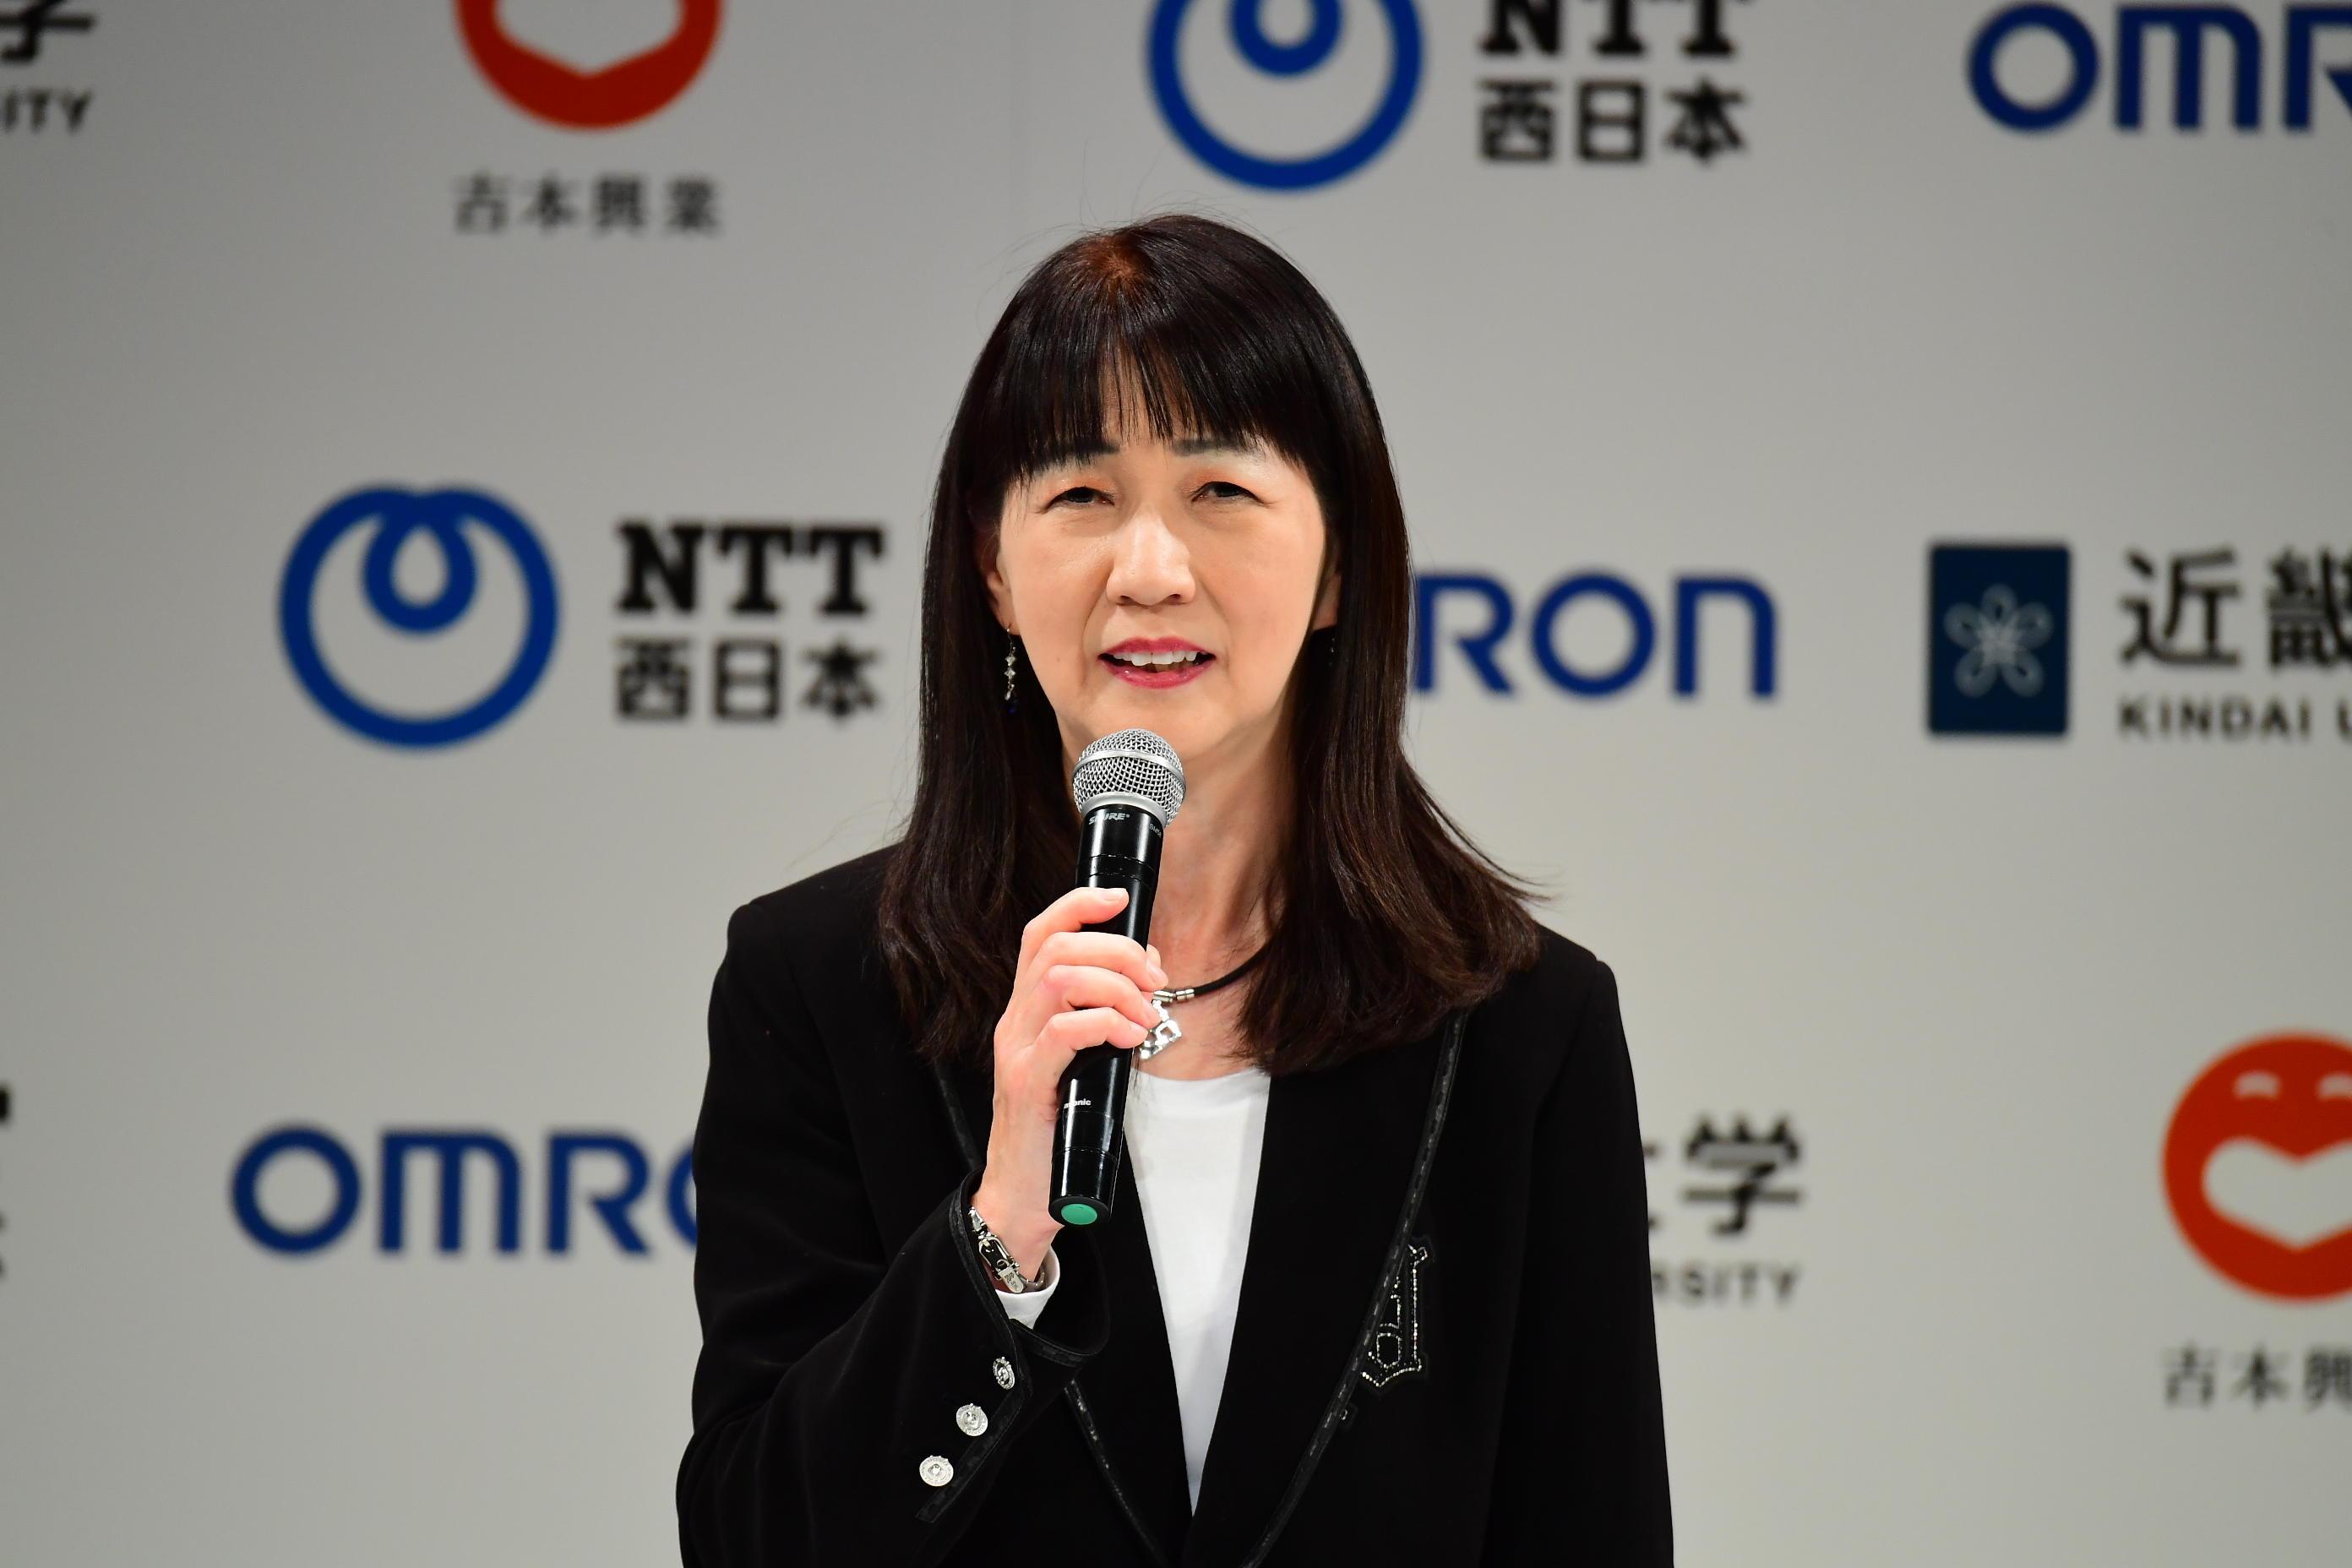 http://news.yoshimoto.co.jp/20170215202151-15ab38803ba2116f5956684d83963b99f625315e.jpg